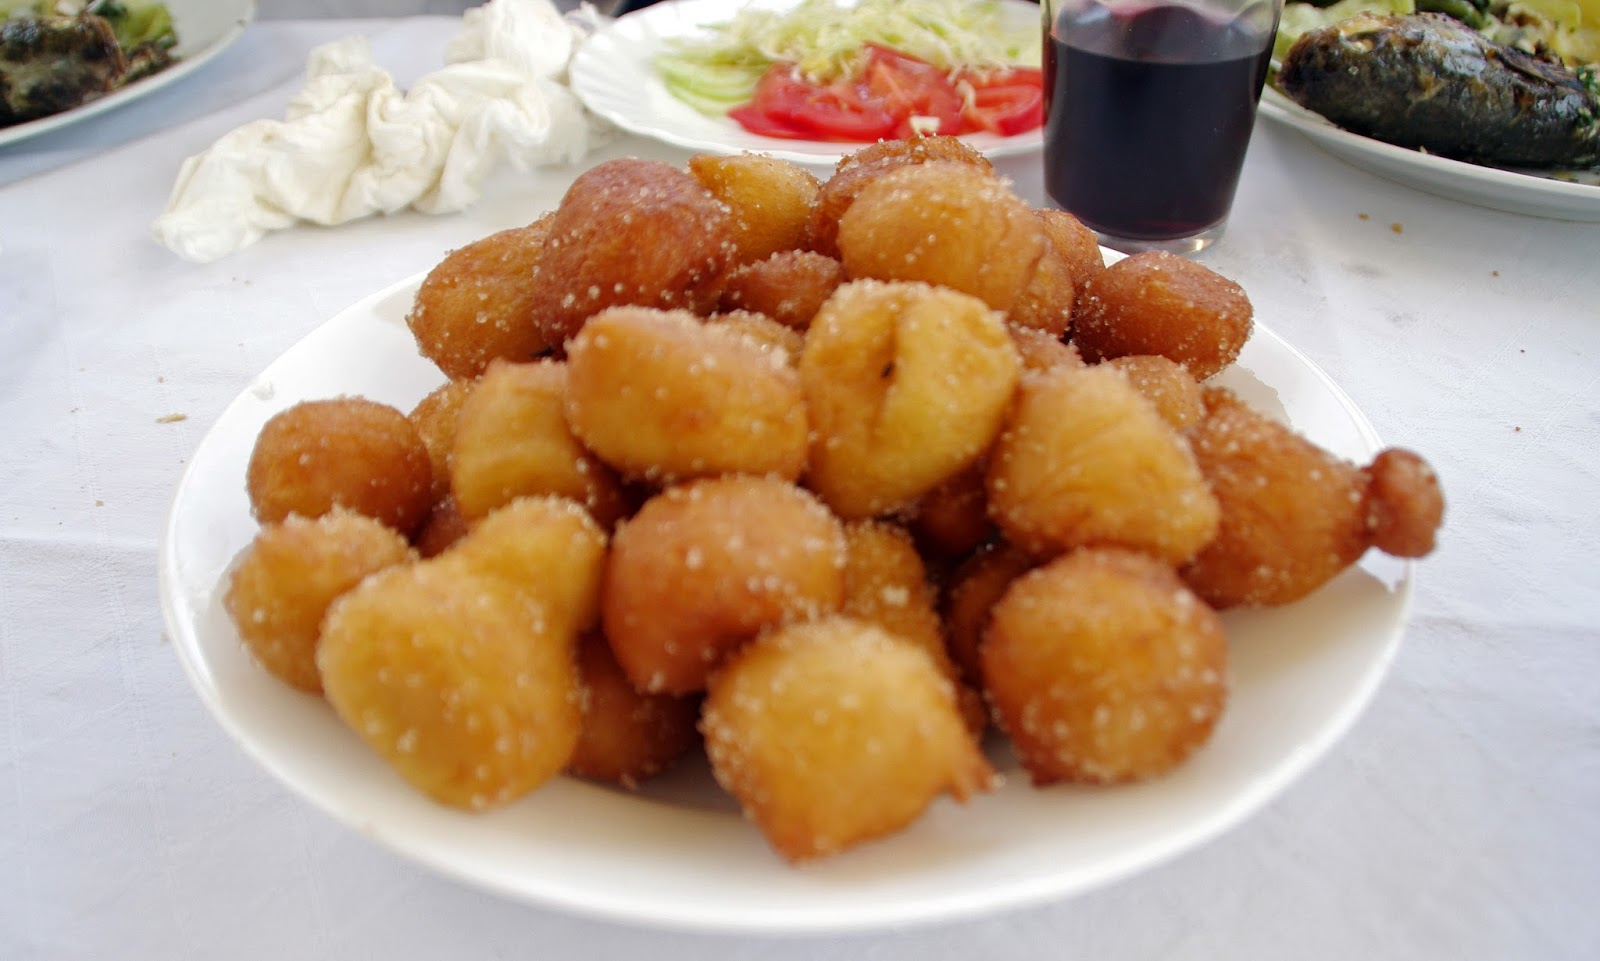 Croatian donuts